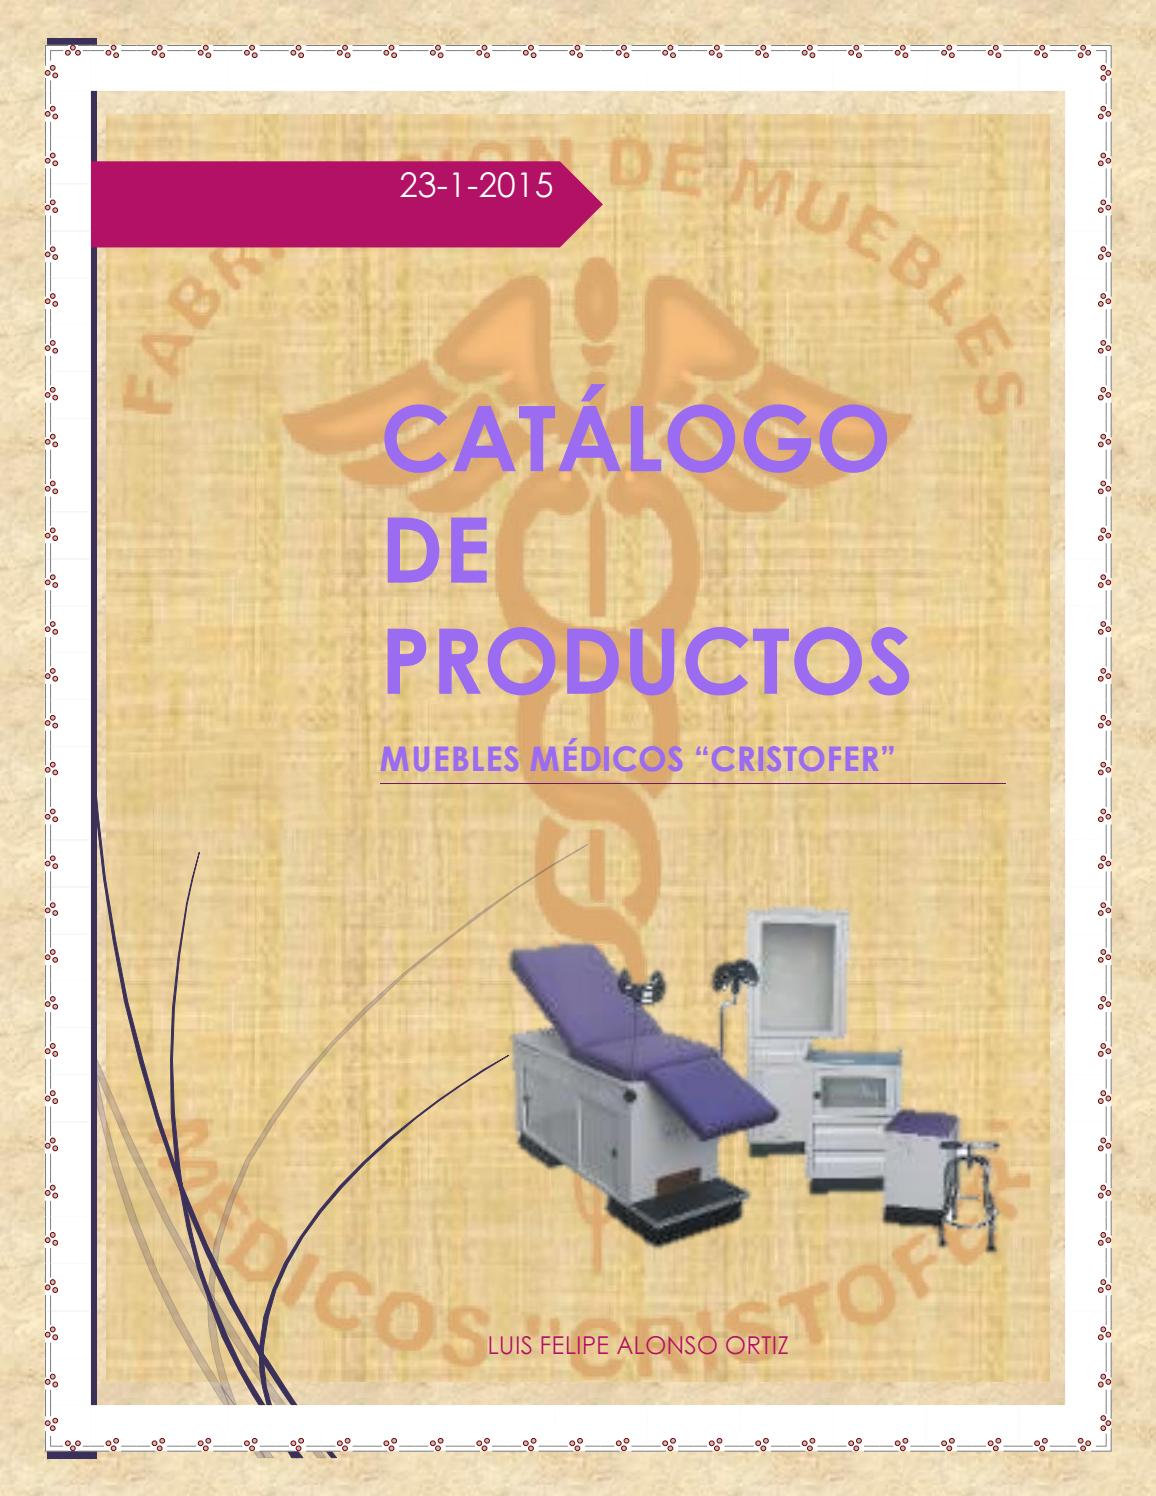 Catalogo Muebles M Dicos Cristofer By Muebles M Dicos Cristofer  # Muebles Fijos Especificaciones